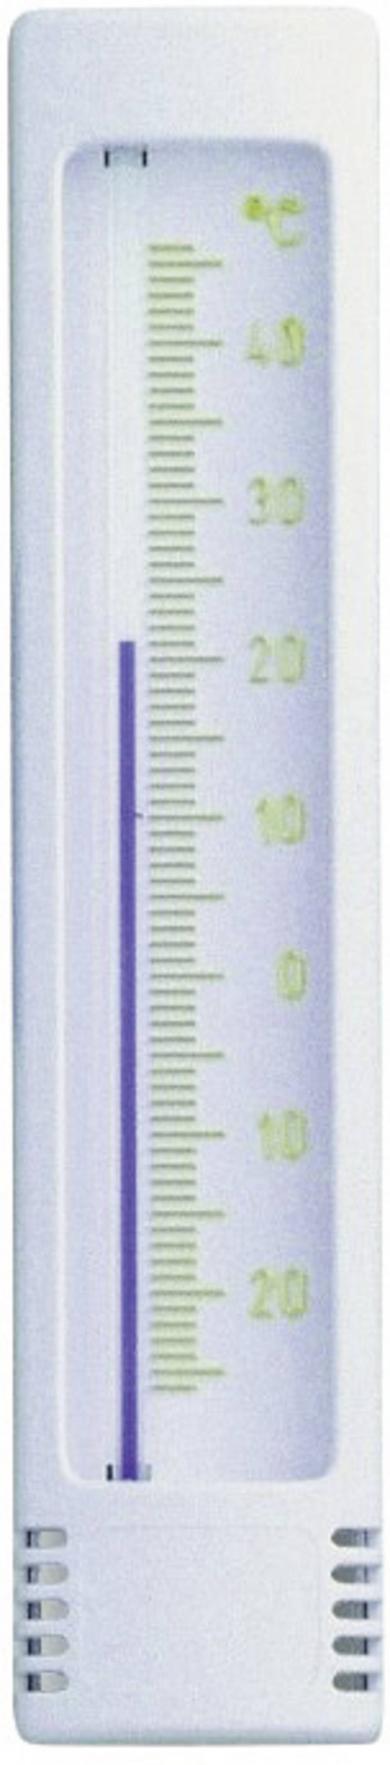 Termometru analogic de perete, alb, TFA 12.3023.02